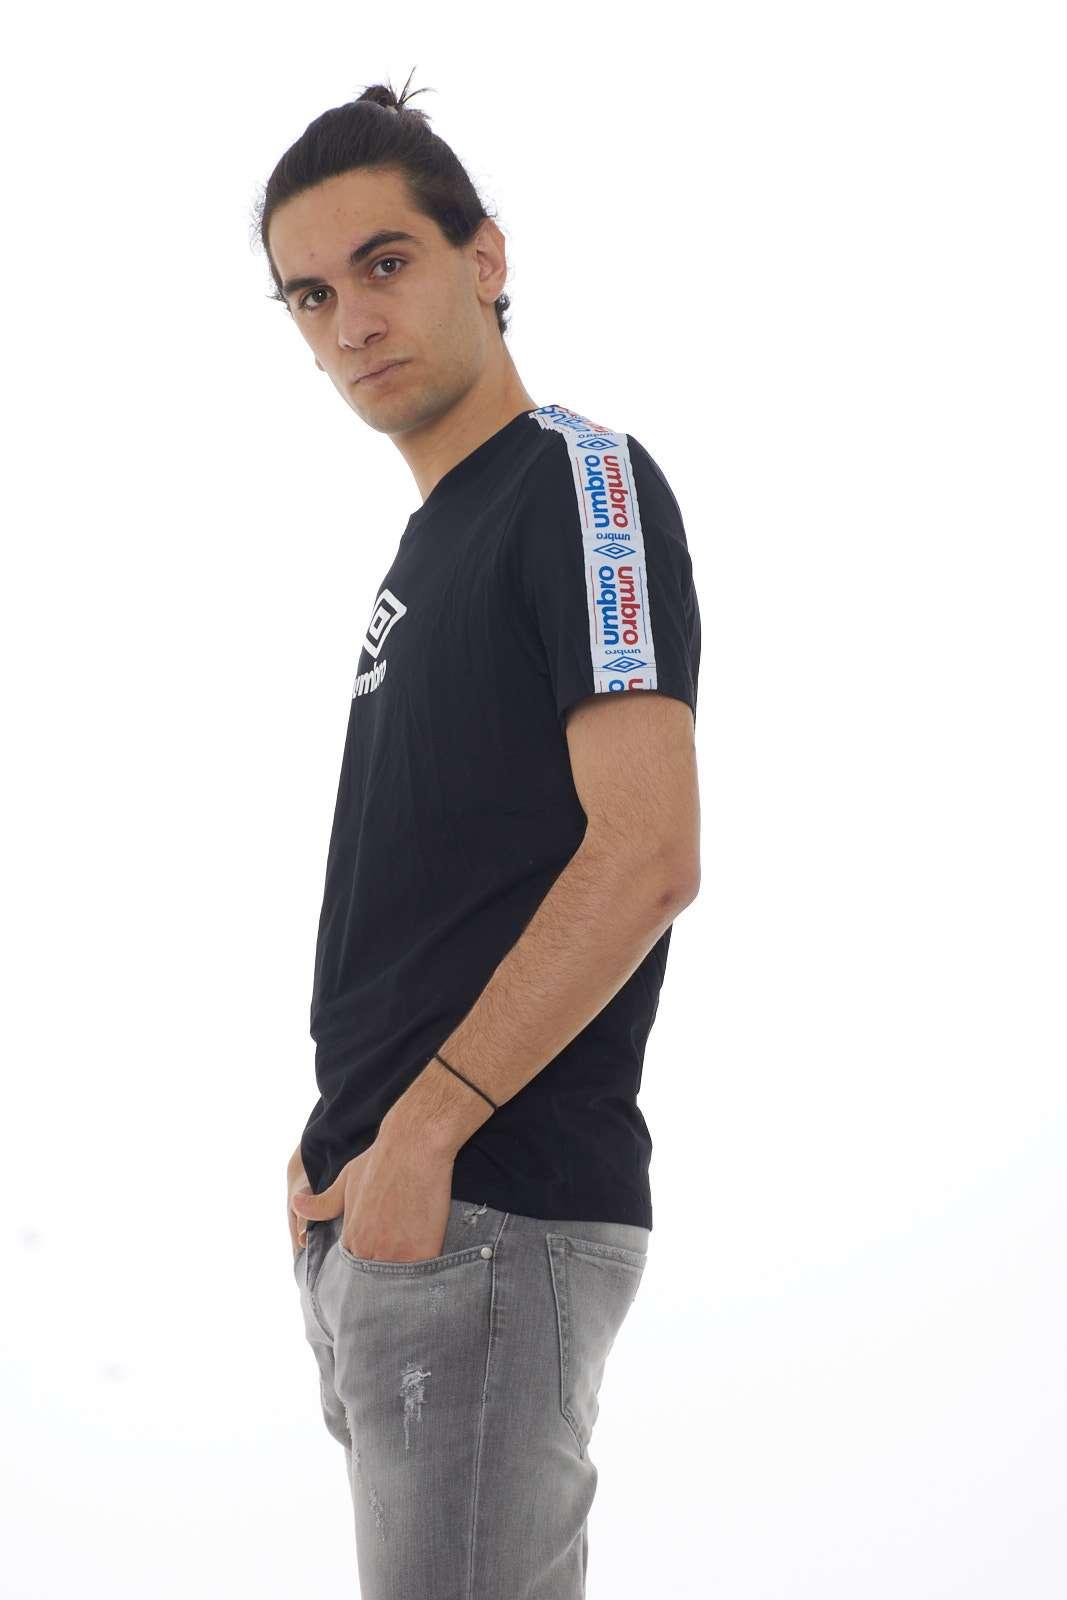 https://www.parmax.com/media/catalog/product/a/i/PE-outlet_parmax-t-shirt-uomo-Umbro-19ETPU0170-B.jpg